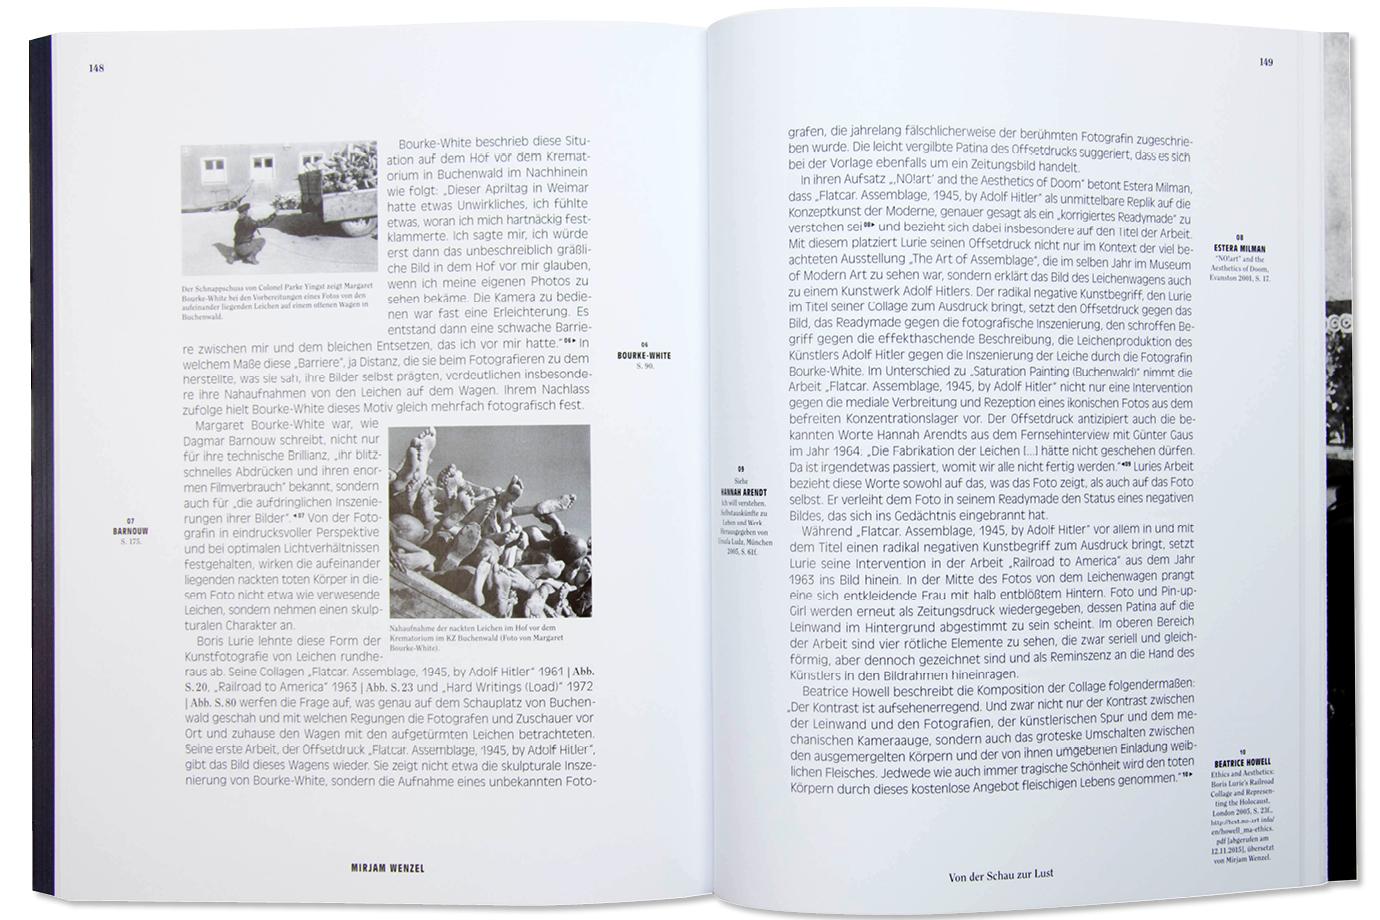 http://e-o-t.de/wordpress/wp-content/uploads/2017/03/Slide-Book_Lurie_7.jpg